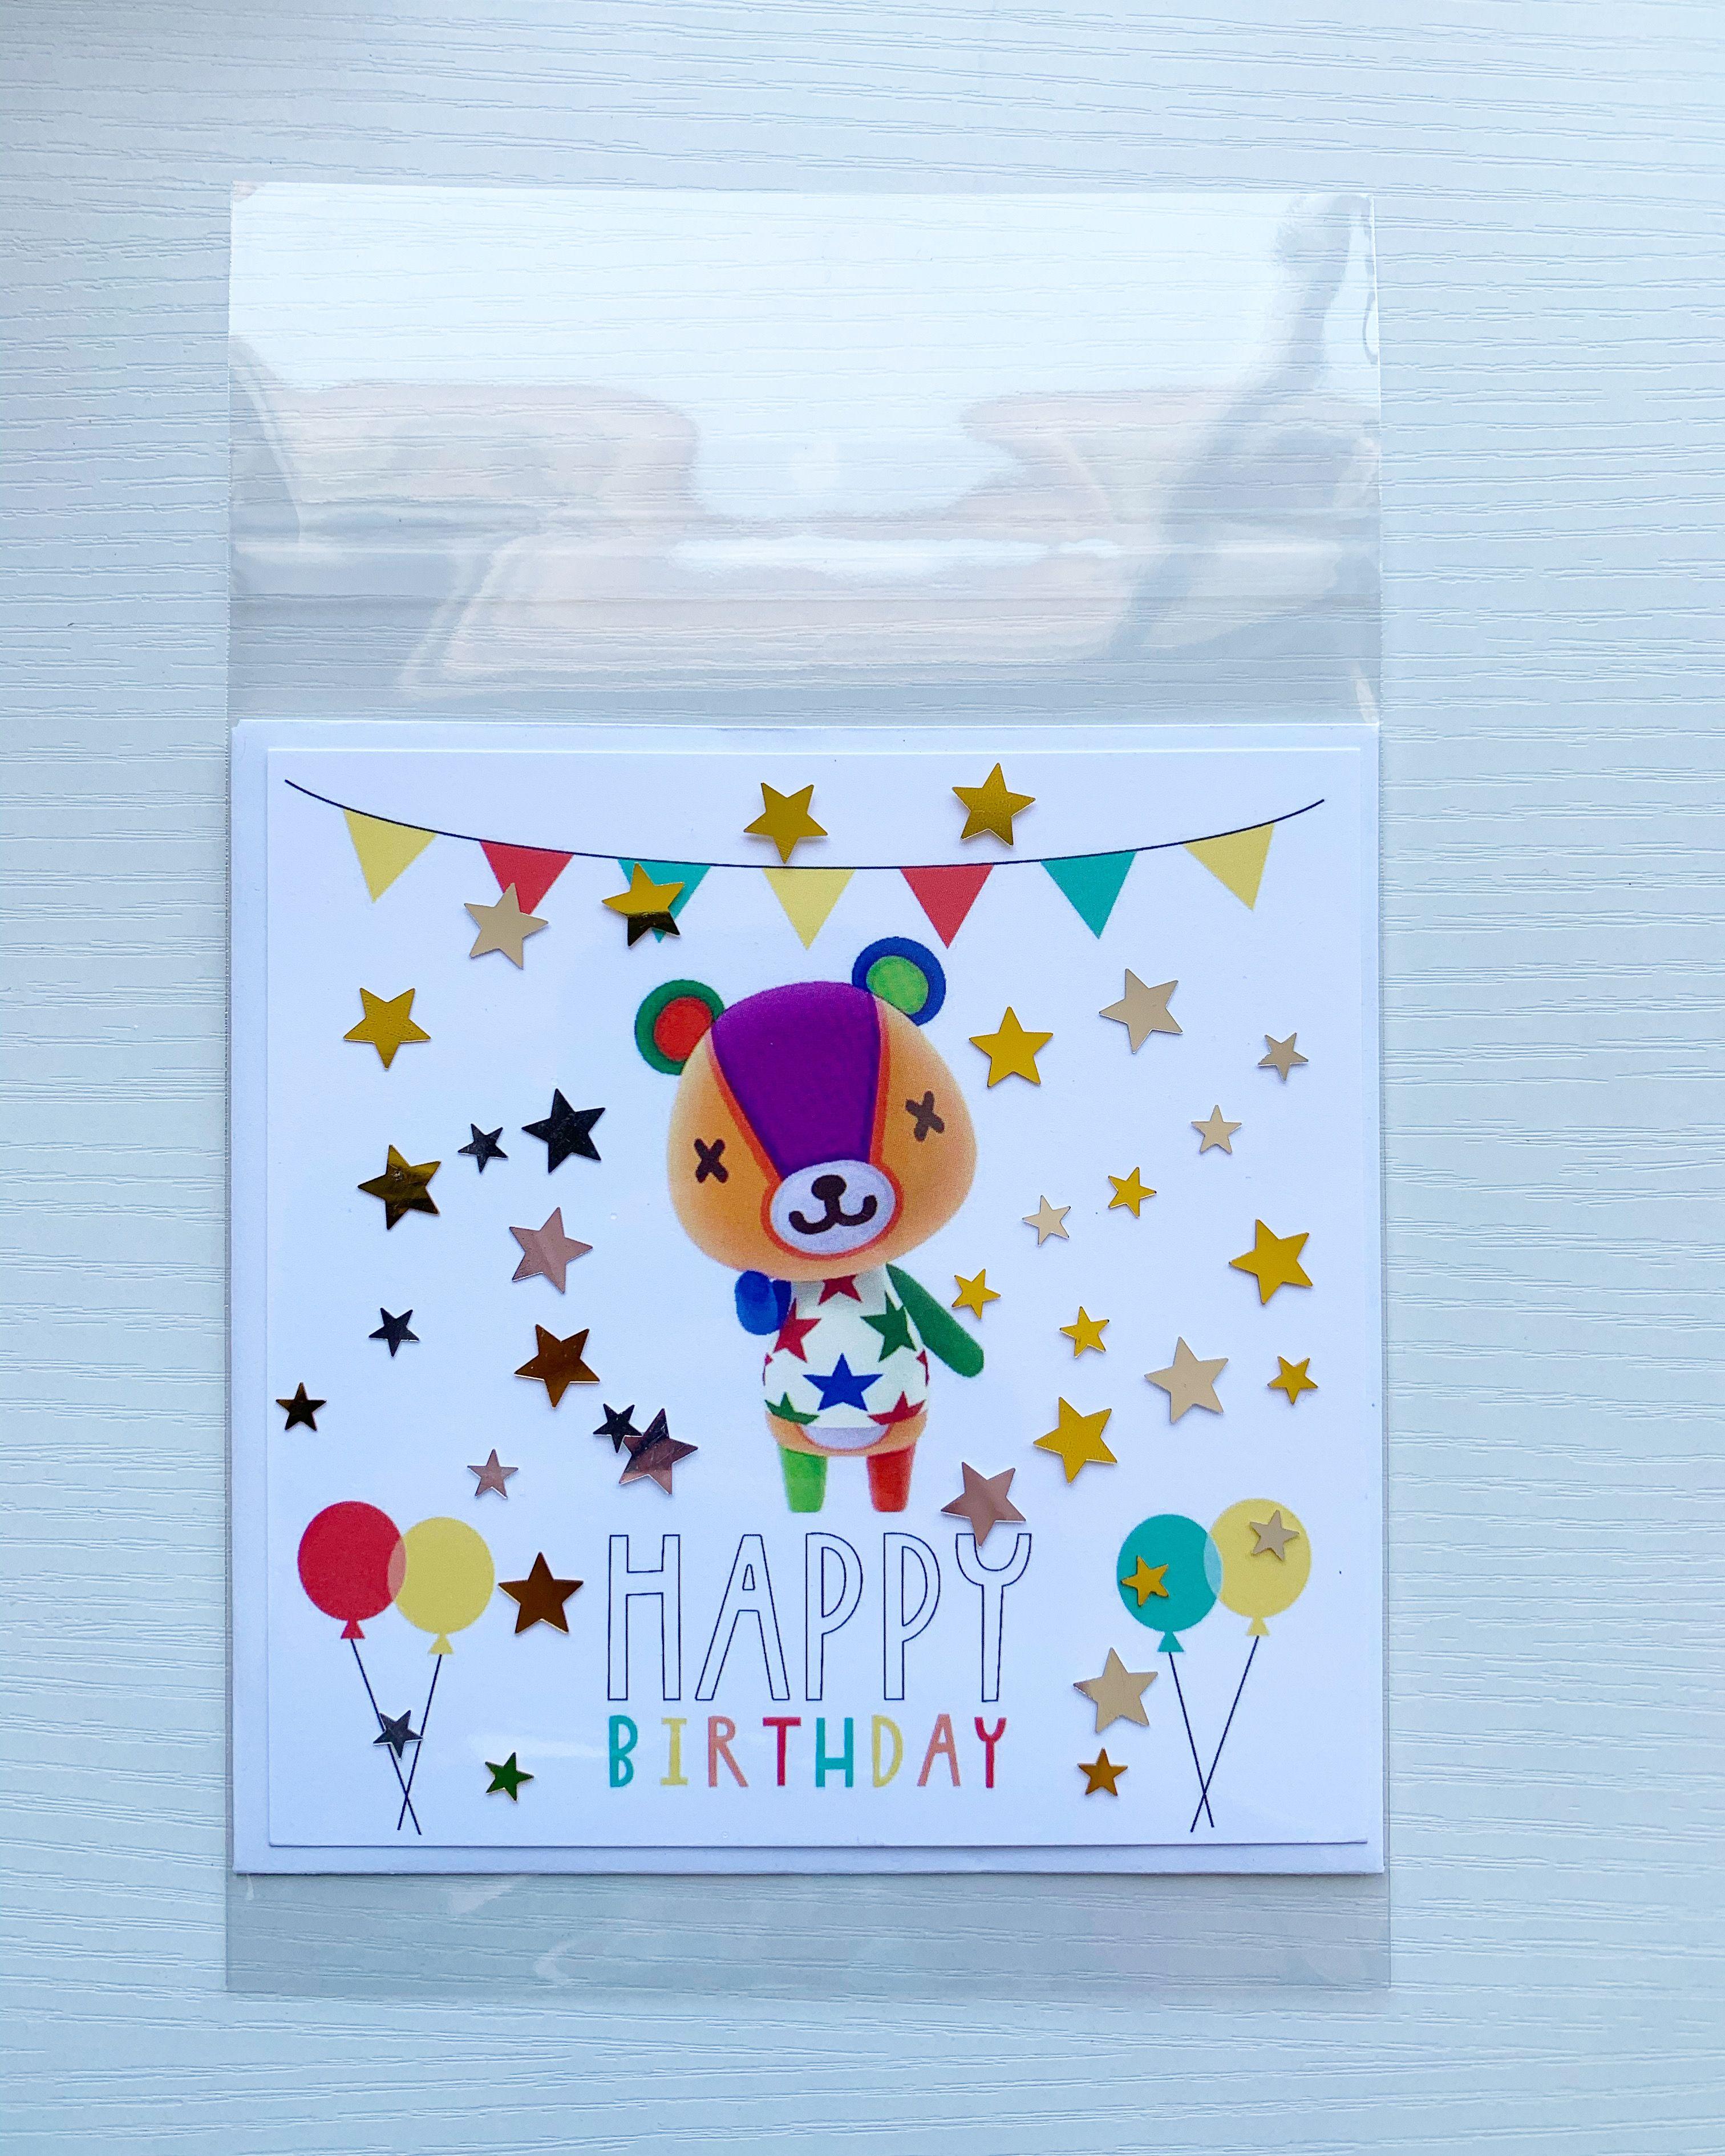 15+ Animal crossing birthday card images